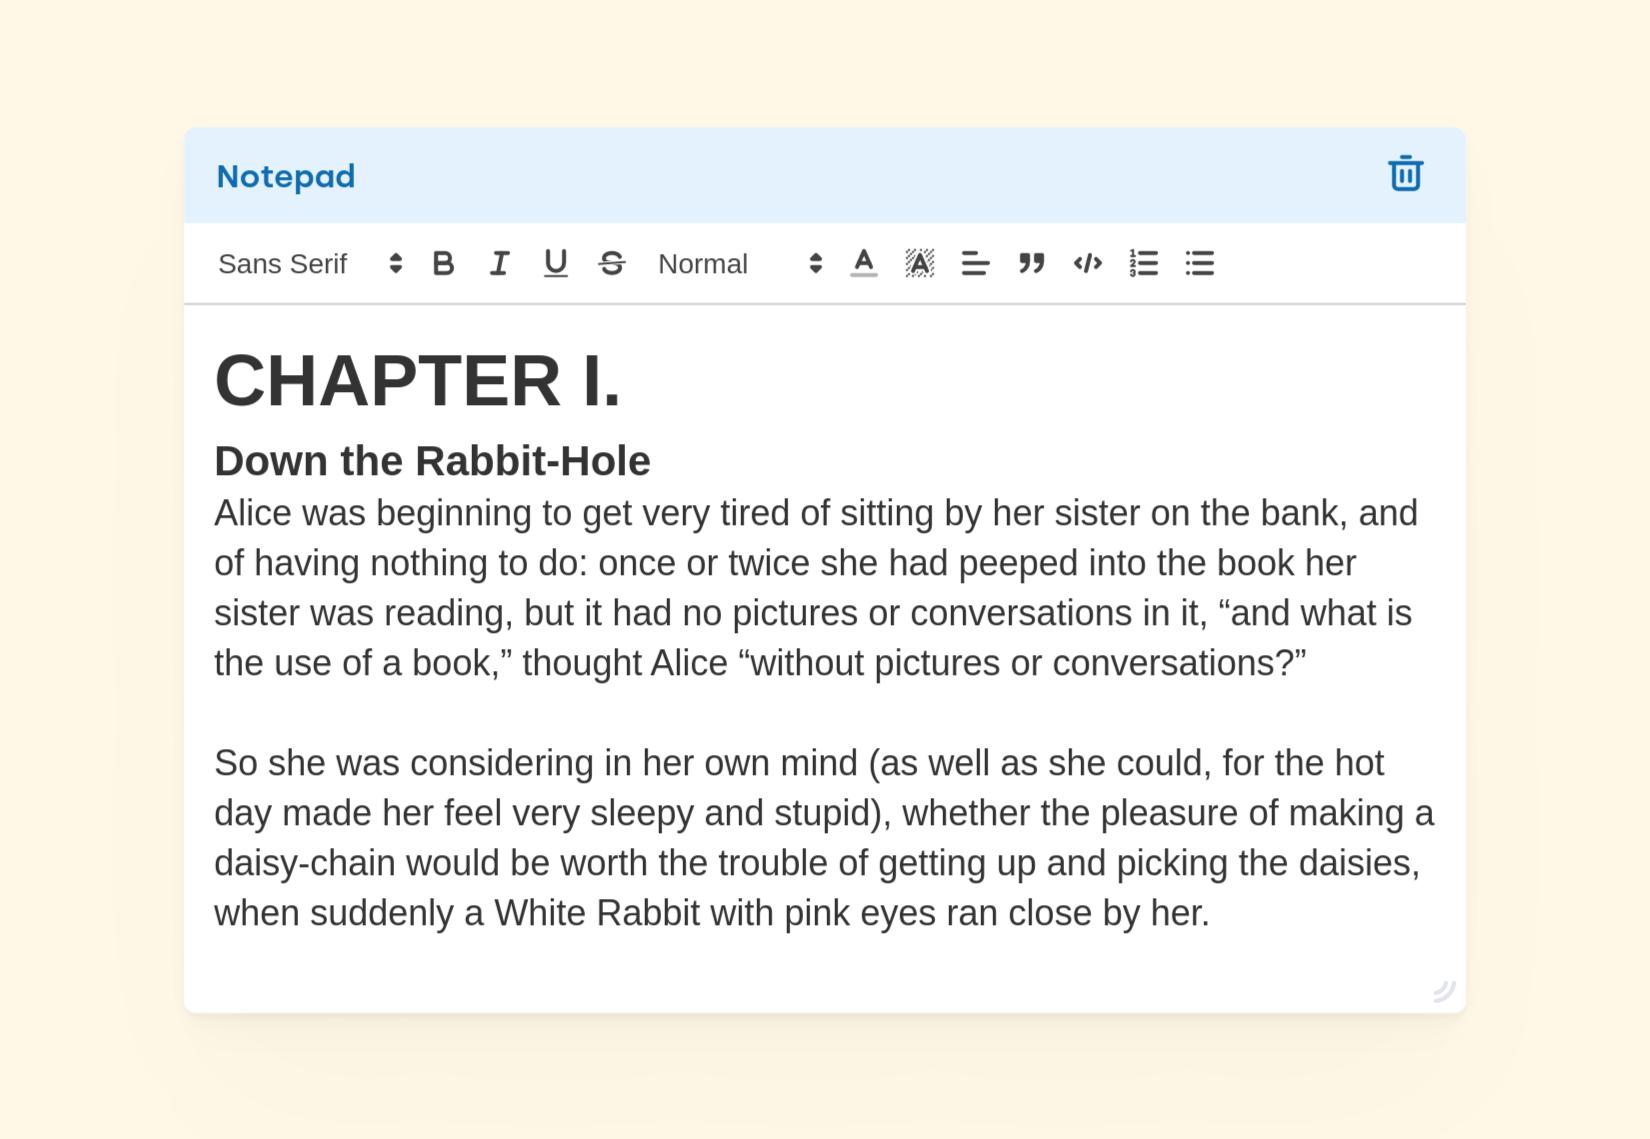 Introducing notepad